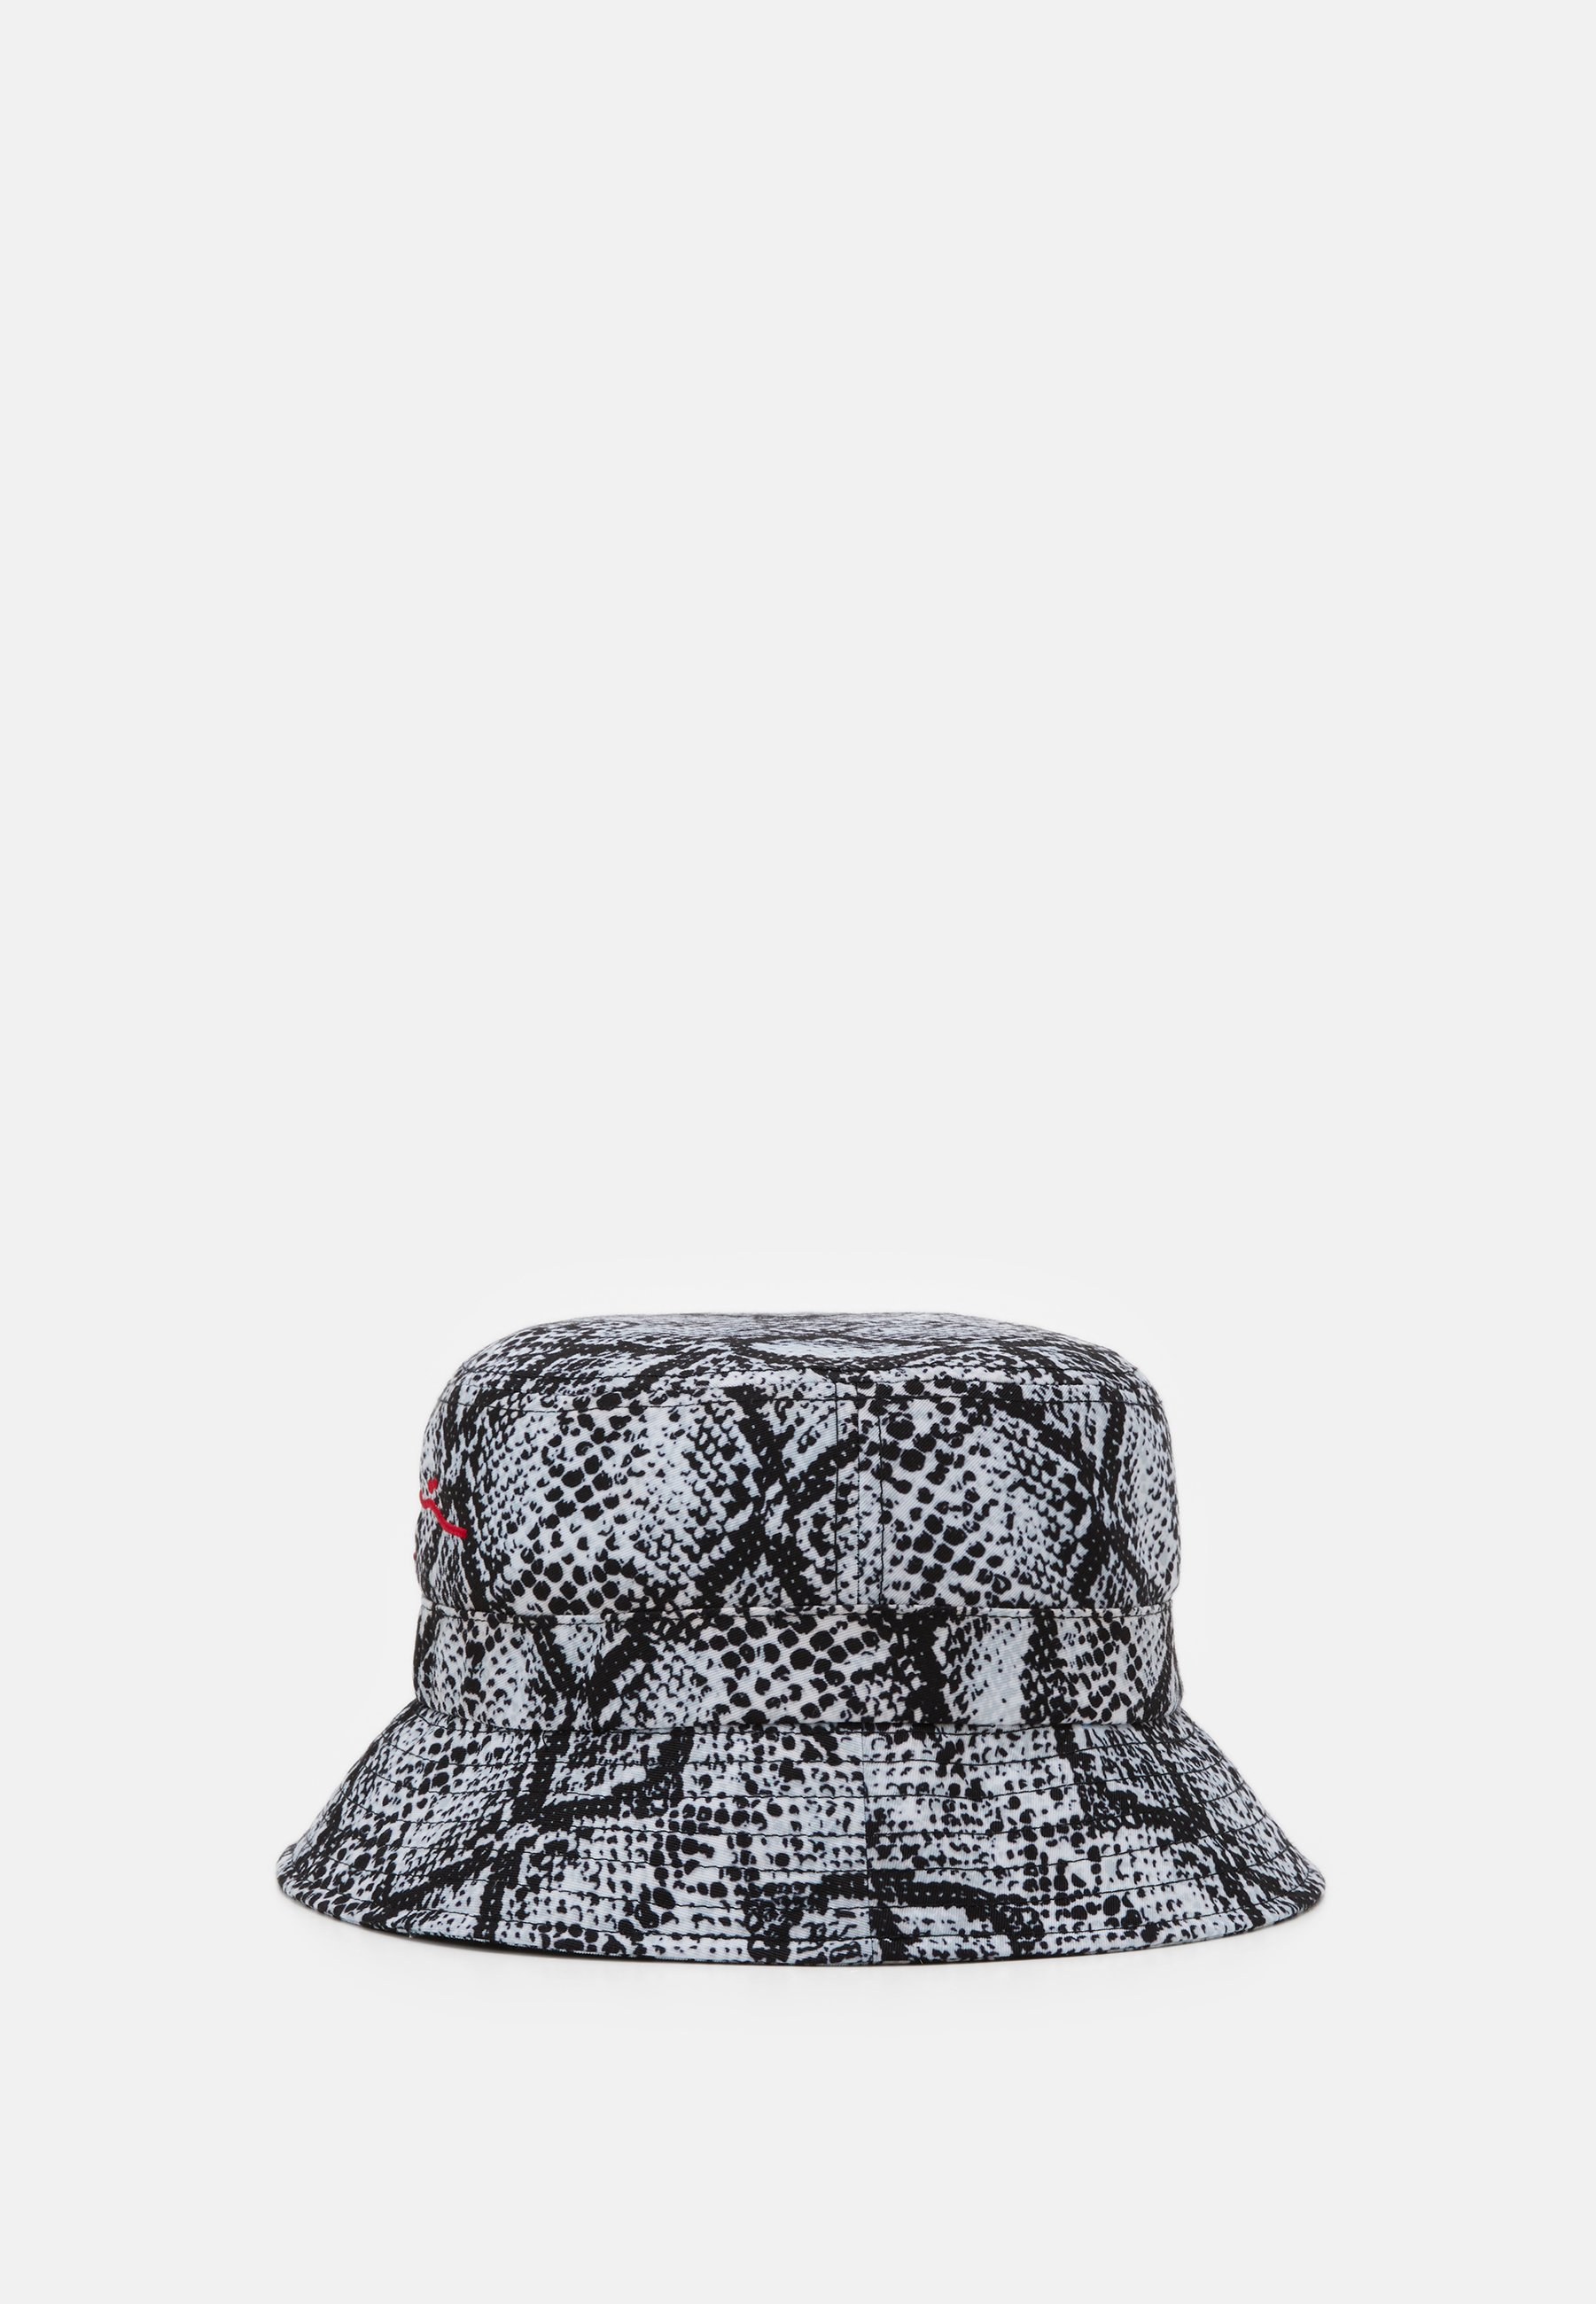 Karl Kani SIGNATURE SNAKE BUCKET HAT - Hatt - black/white/red/svart W3dUFb32yQPDicT